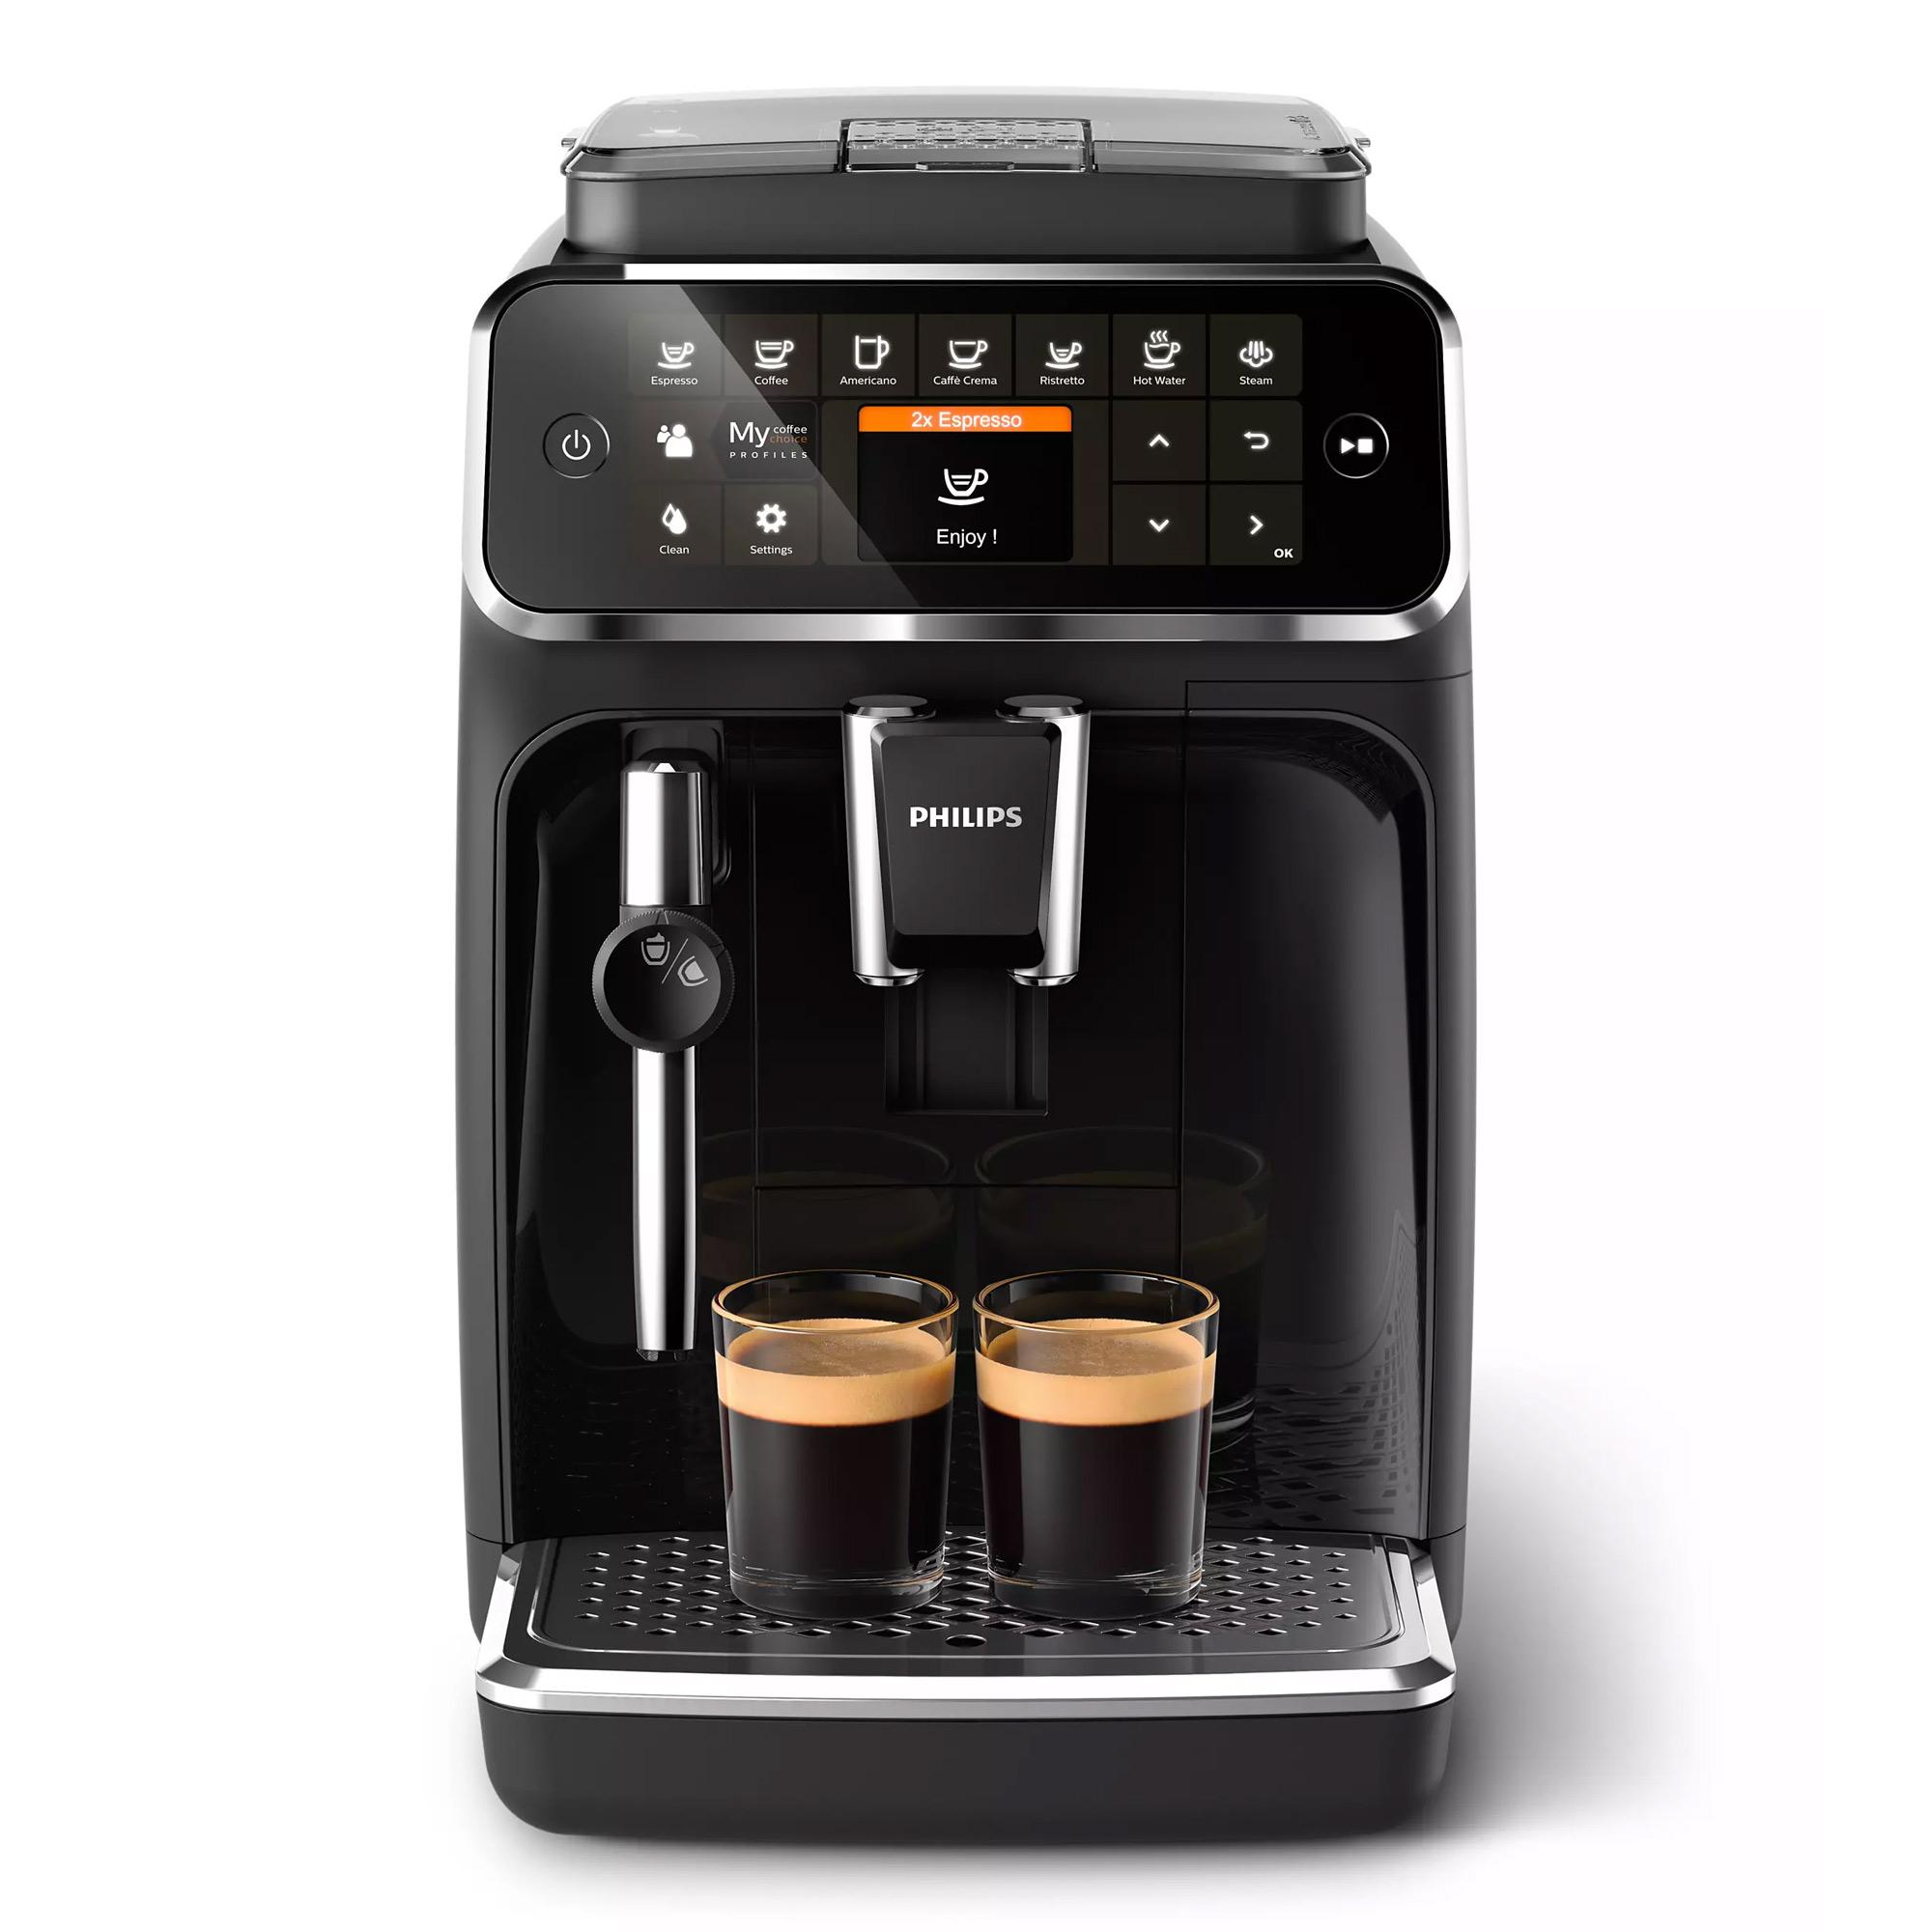 Philips / Saeco 4300 Classic Milk Frother Superautomatic Espresso Machine - EP41/54